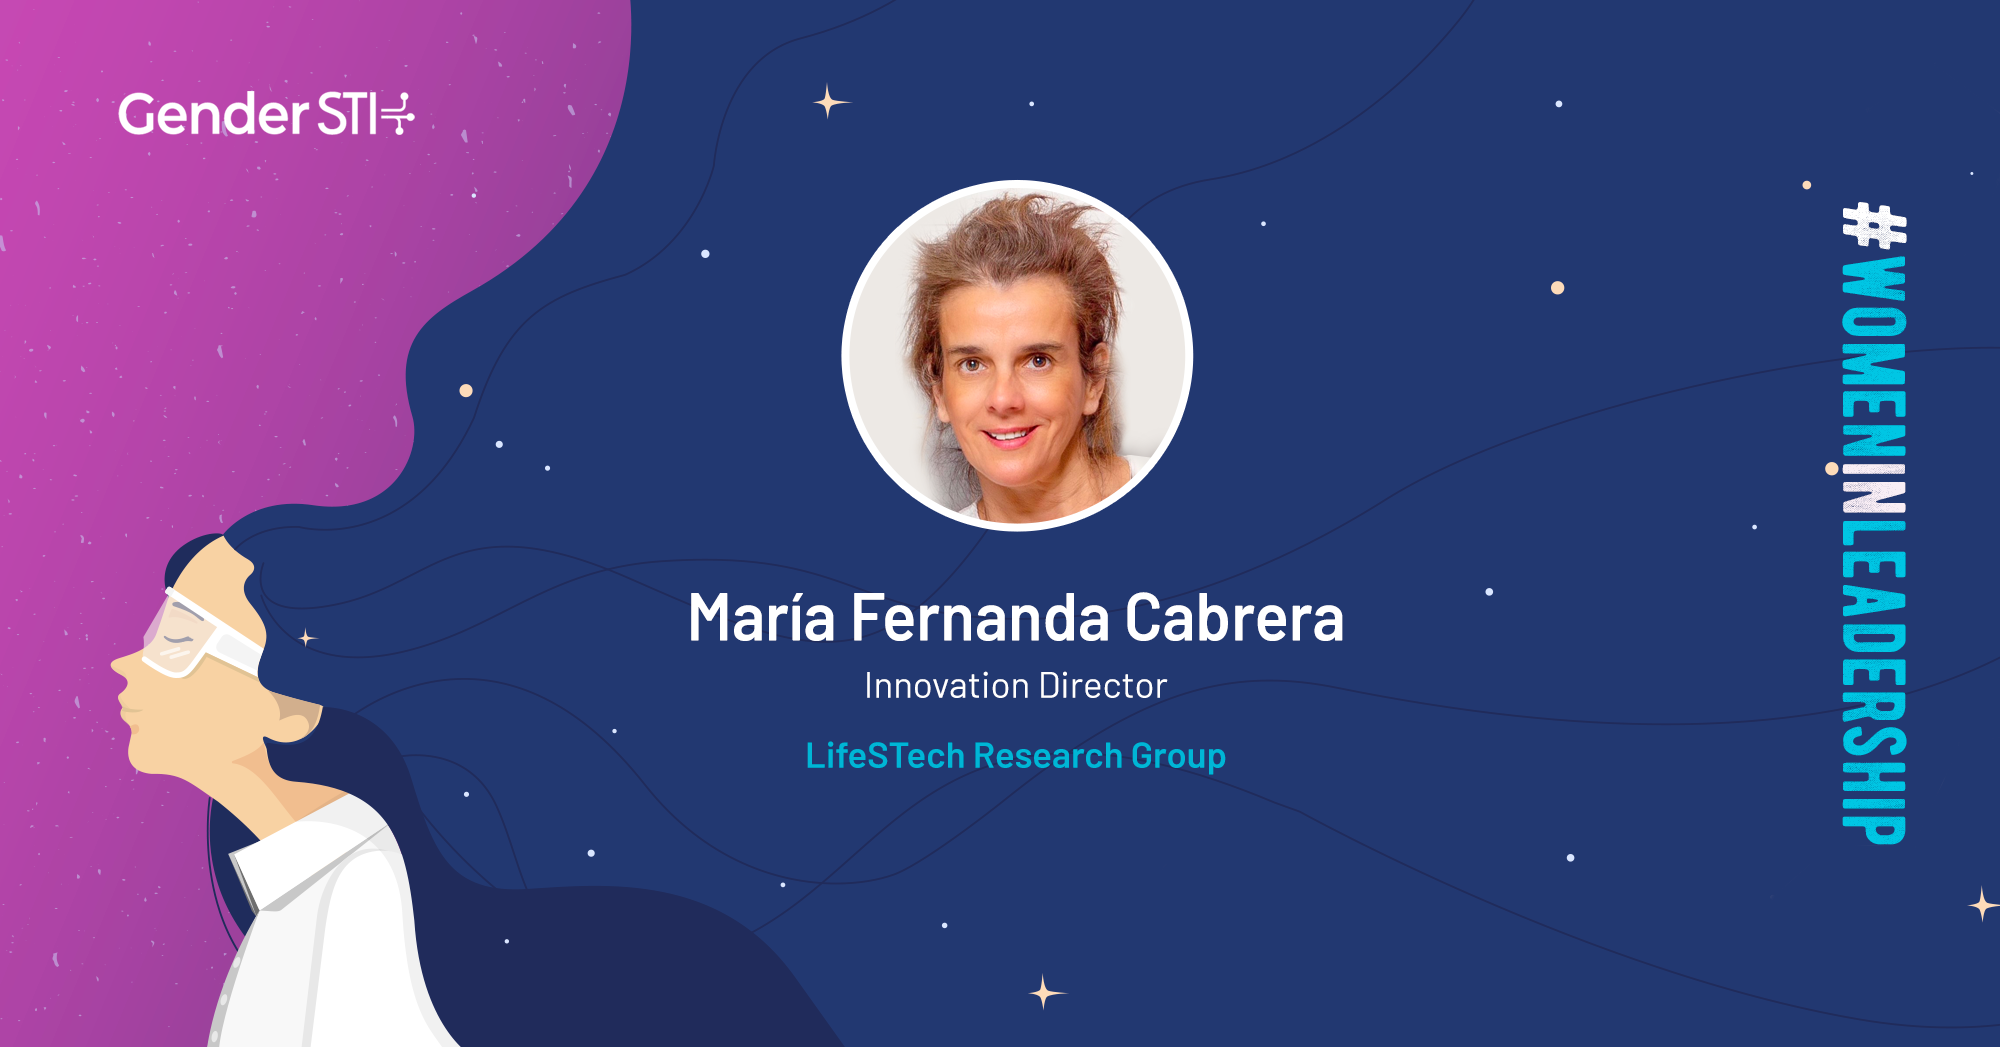 María Fernanda Cabrera, Innovation Director at the LifeSTech Research Group, is one of GenderSTI's #WomenInLeadership nominees.